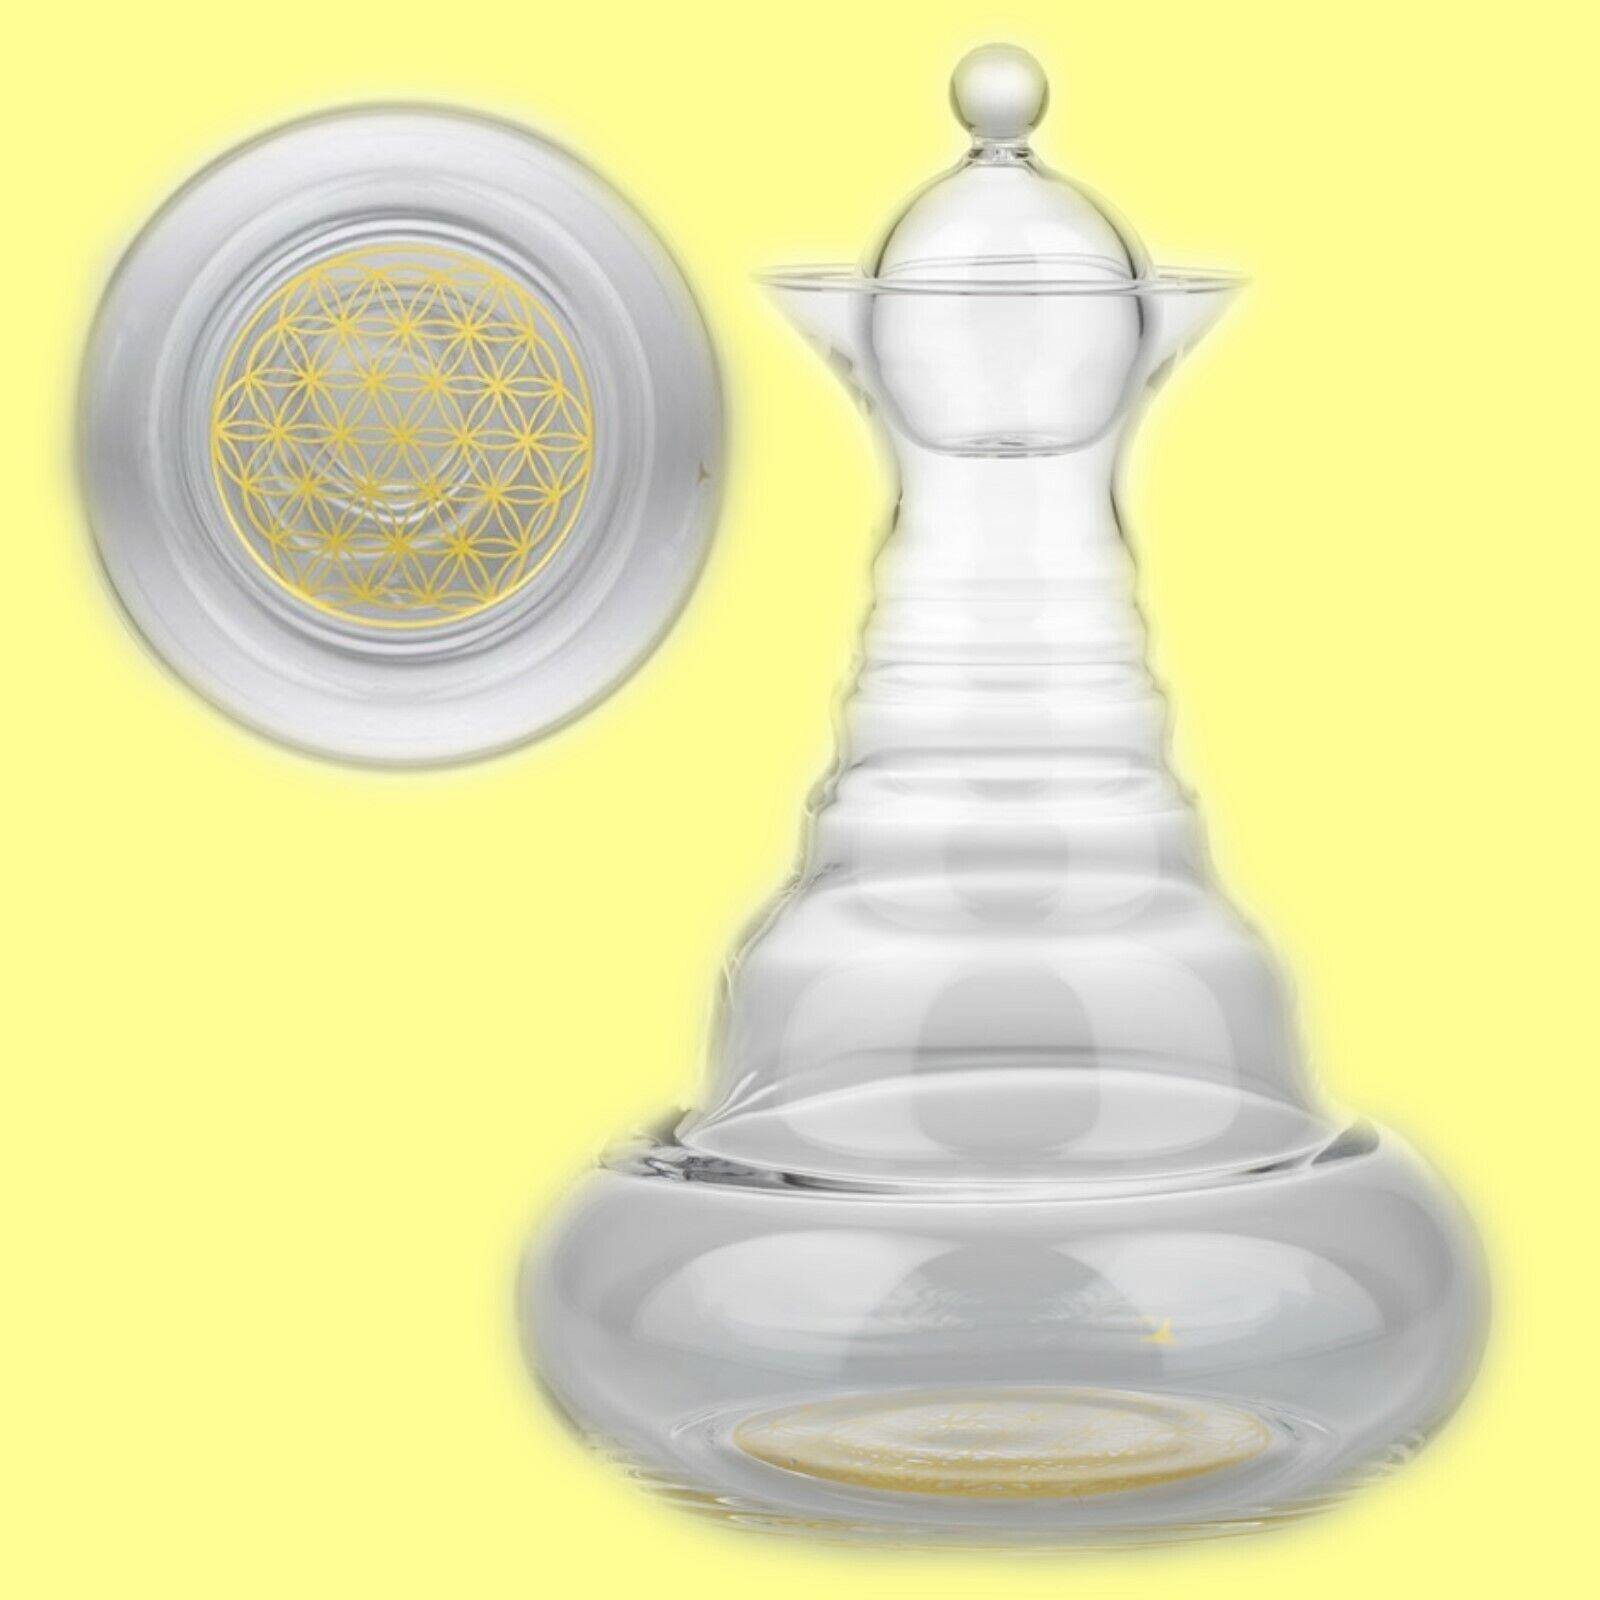 Karaffe Alladin Gold 1,3 L L L Glas Vitalkaraffe Blaume des Lebens am Boden in Gold 52abb0